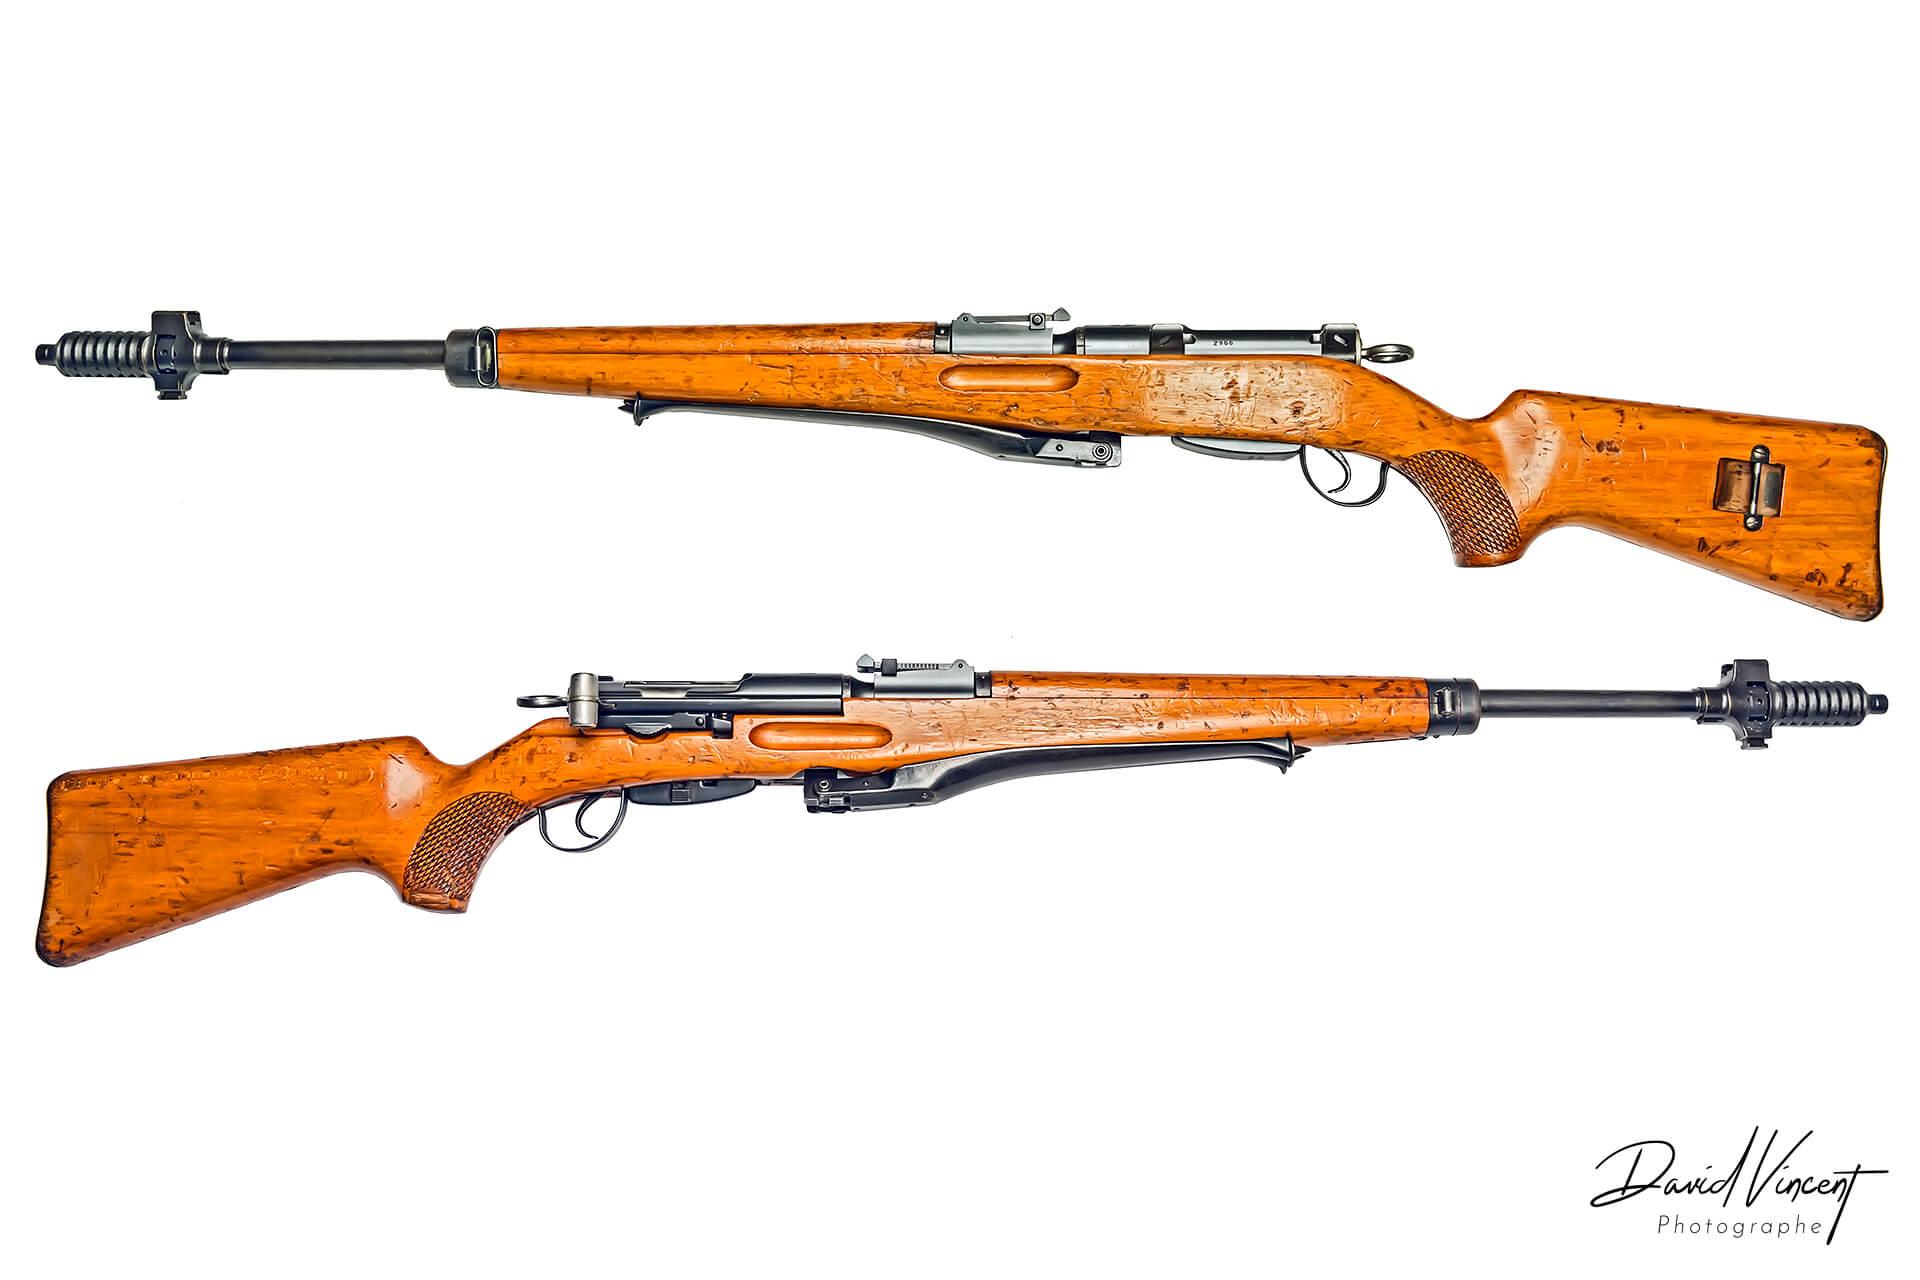 Swiss K55 Firearms Photographer